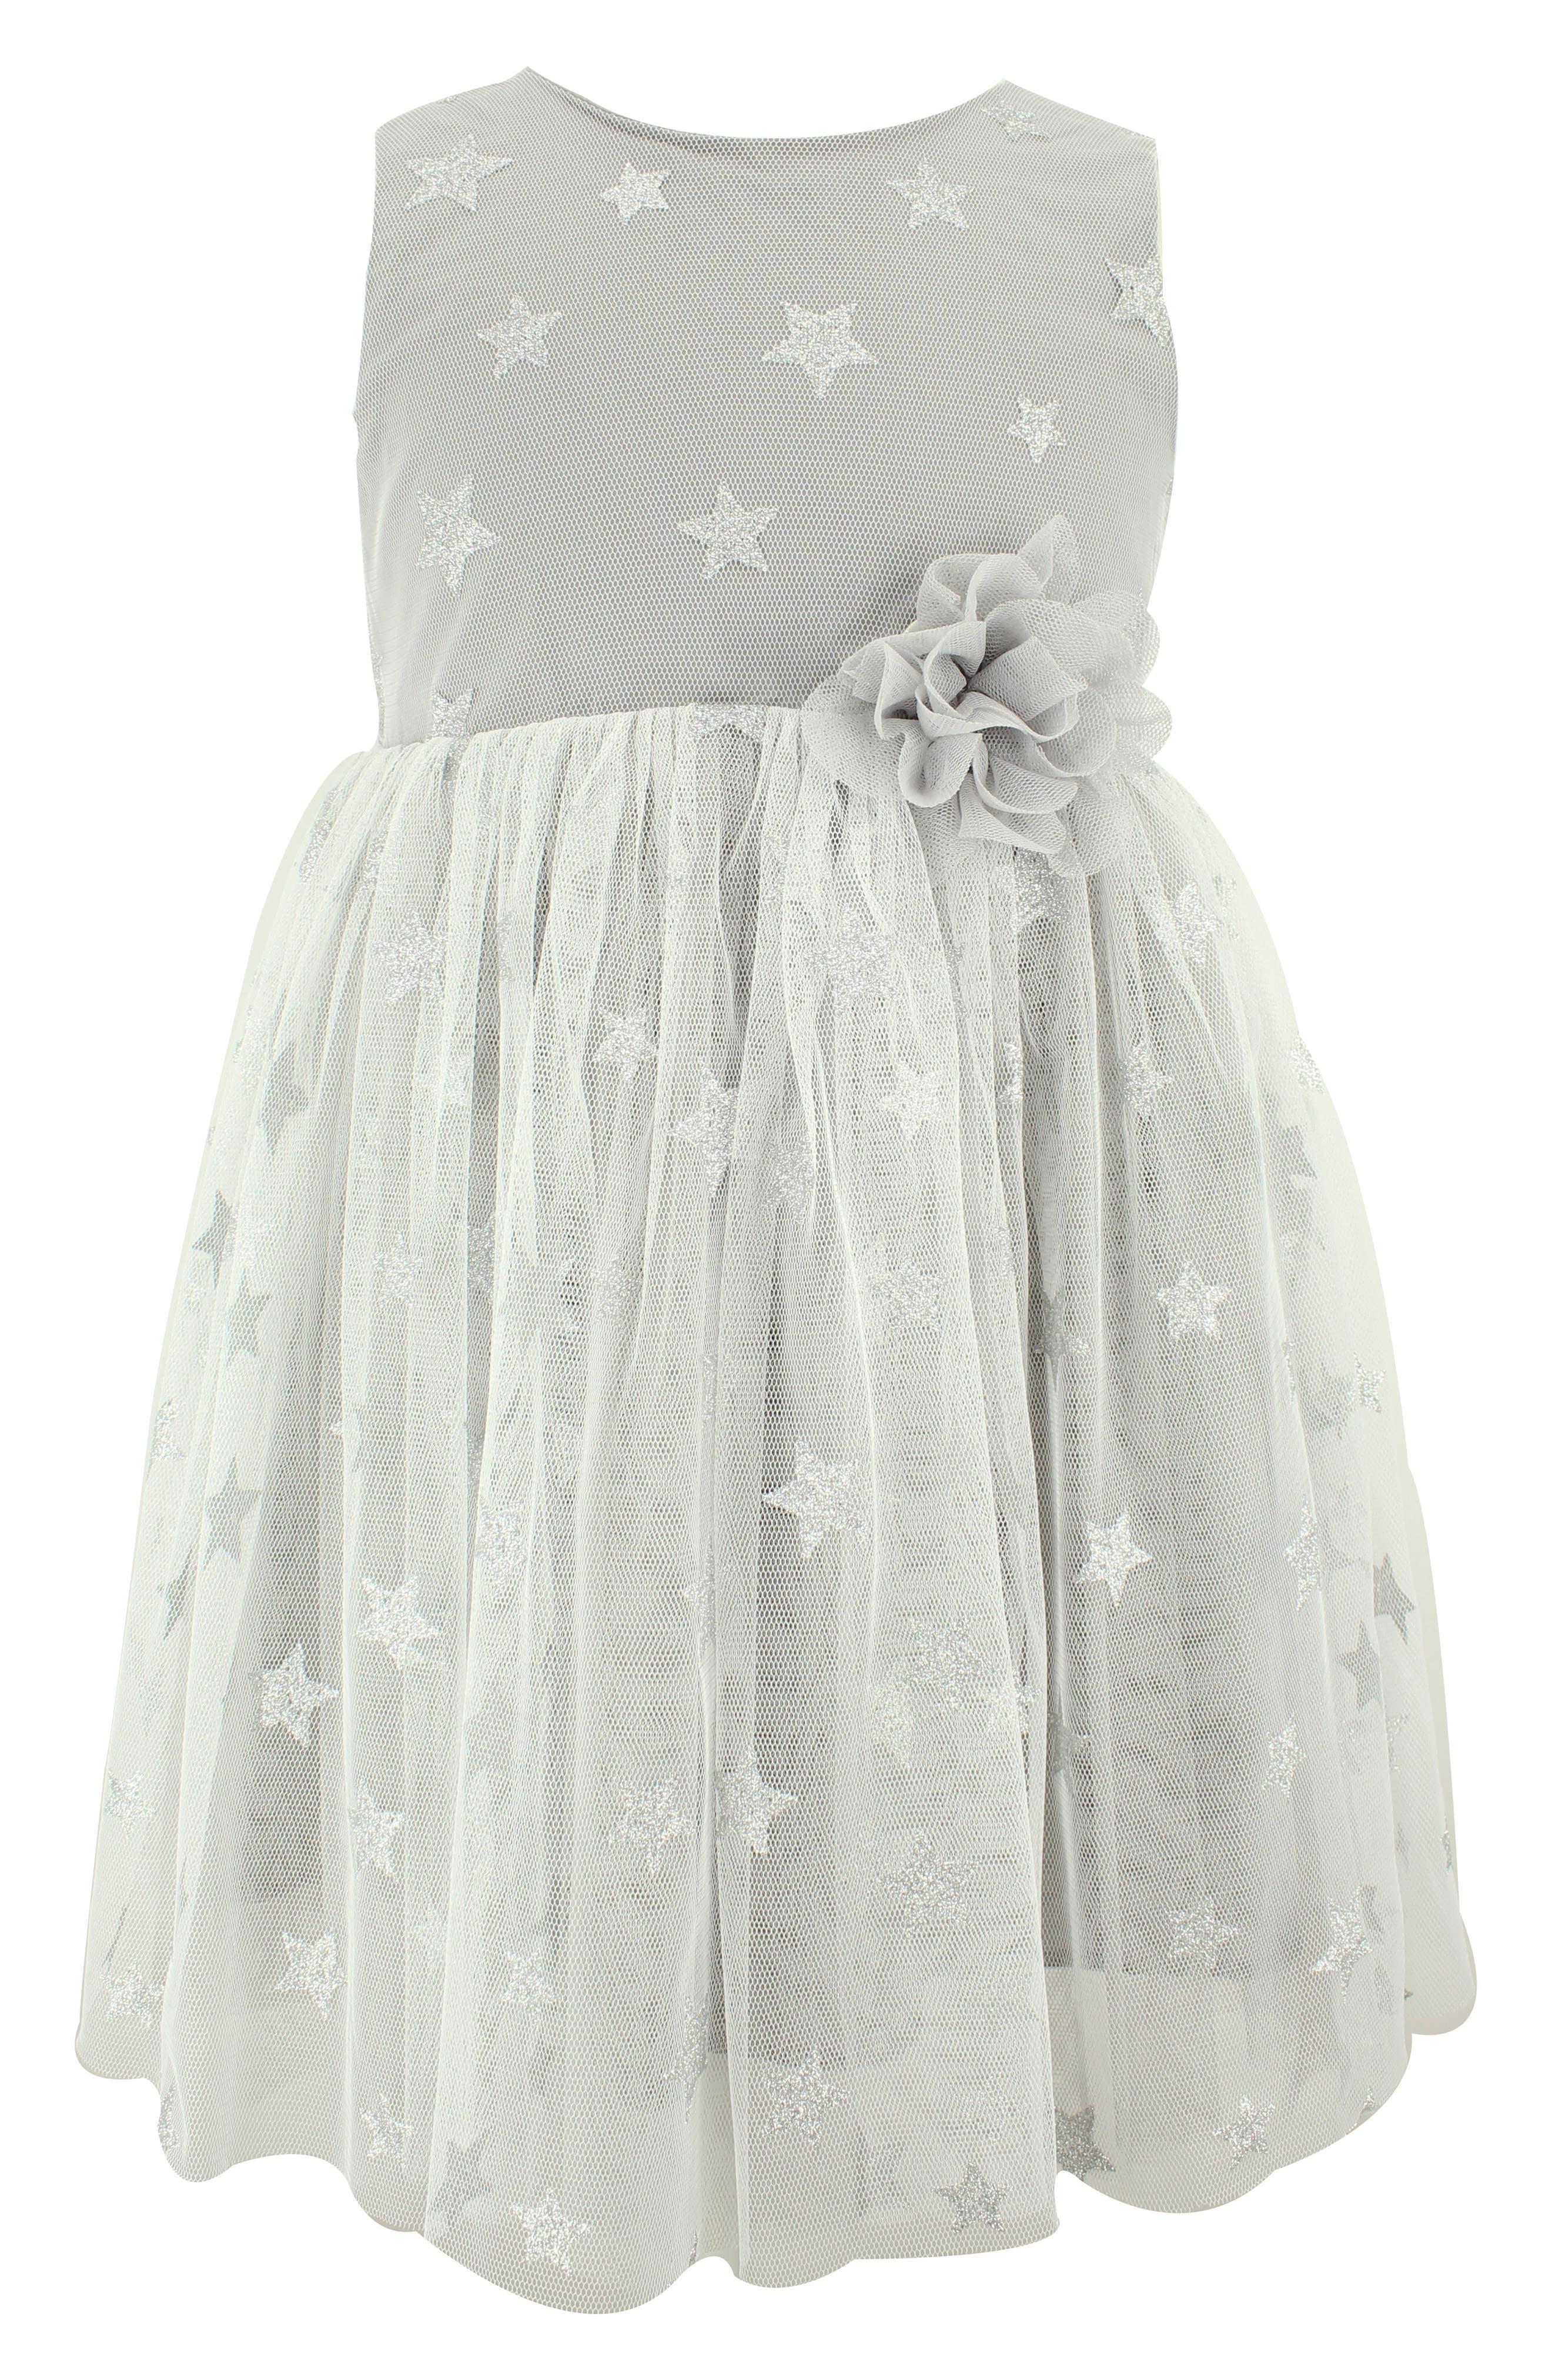 POPATU Glitter Star Tulle Dress, Main, color, SILVER